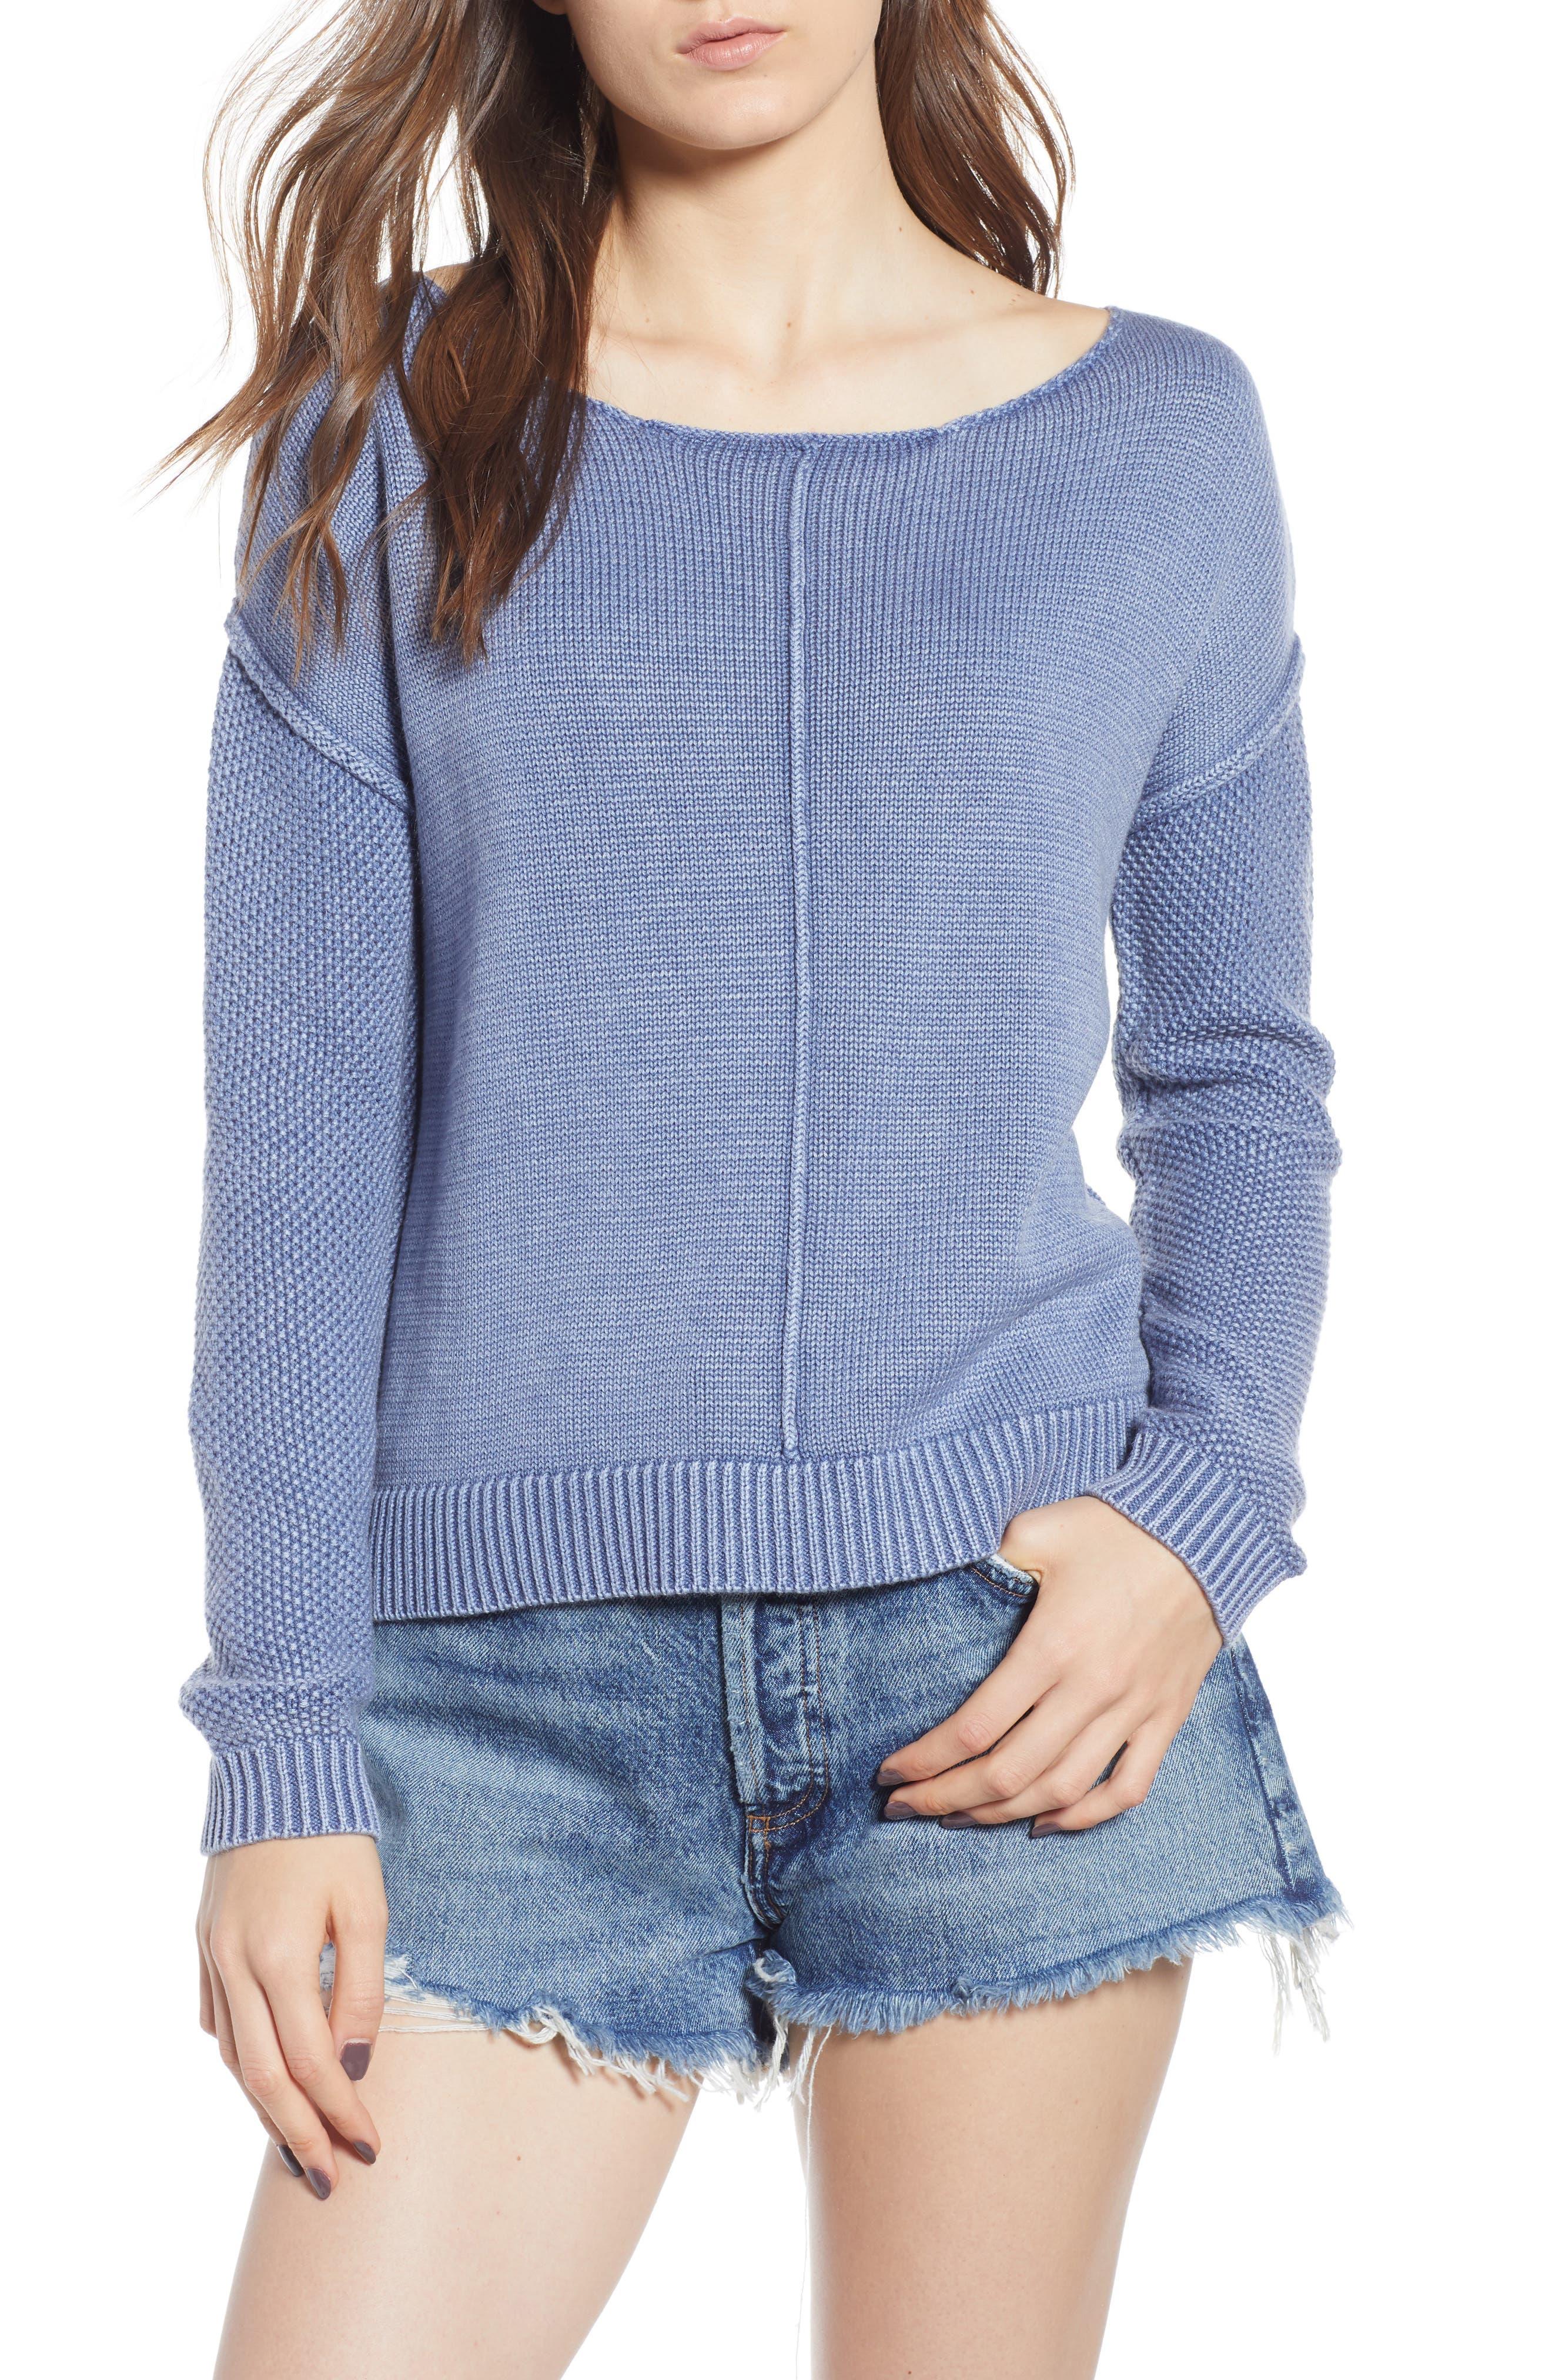 Erin Knit Sweater,                             Main thumbnail 1, color,                             Sand Washed Indigo